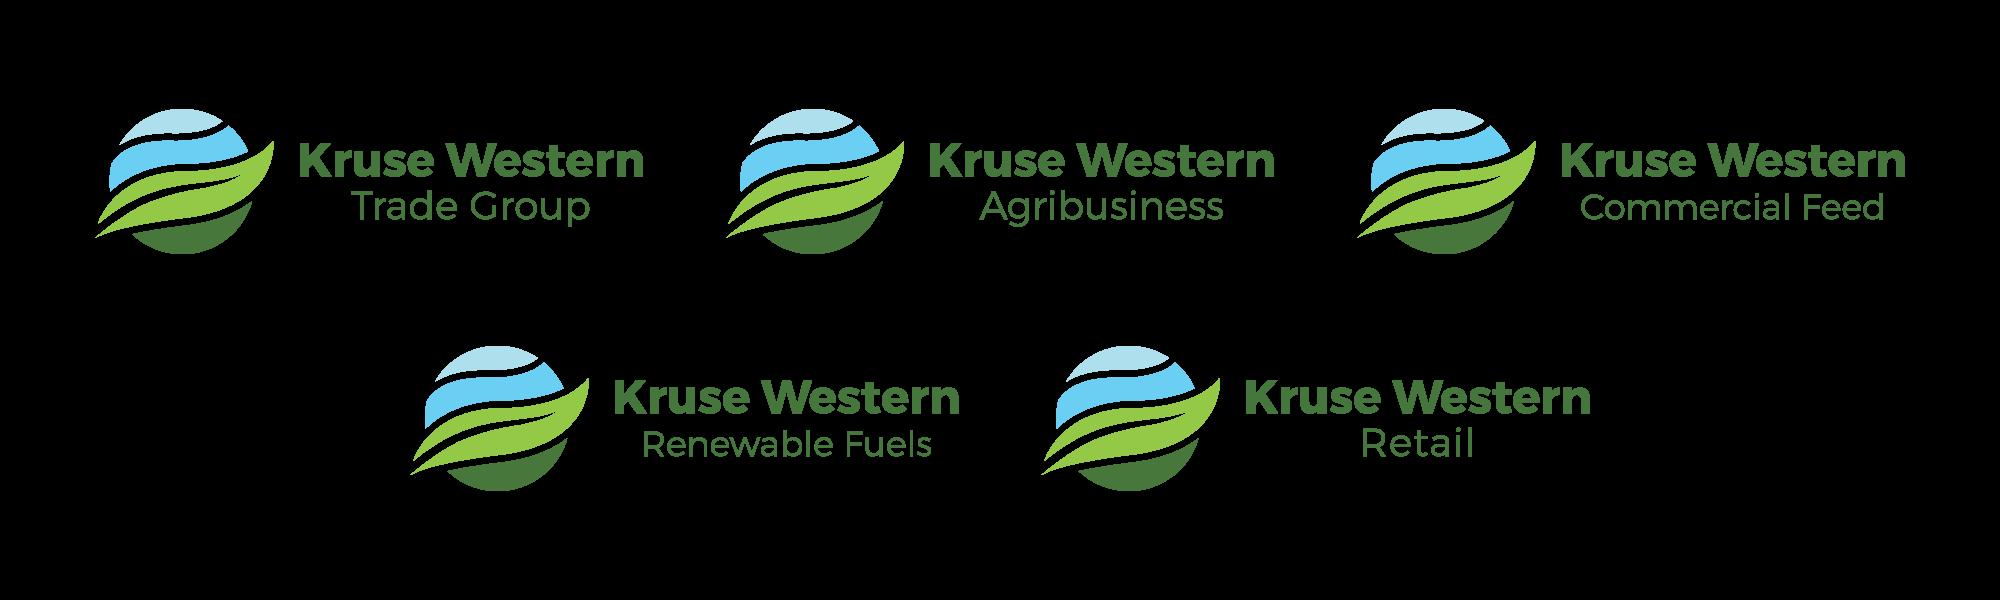 FCG_KW_Logos_03